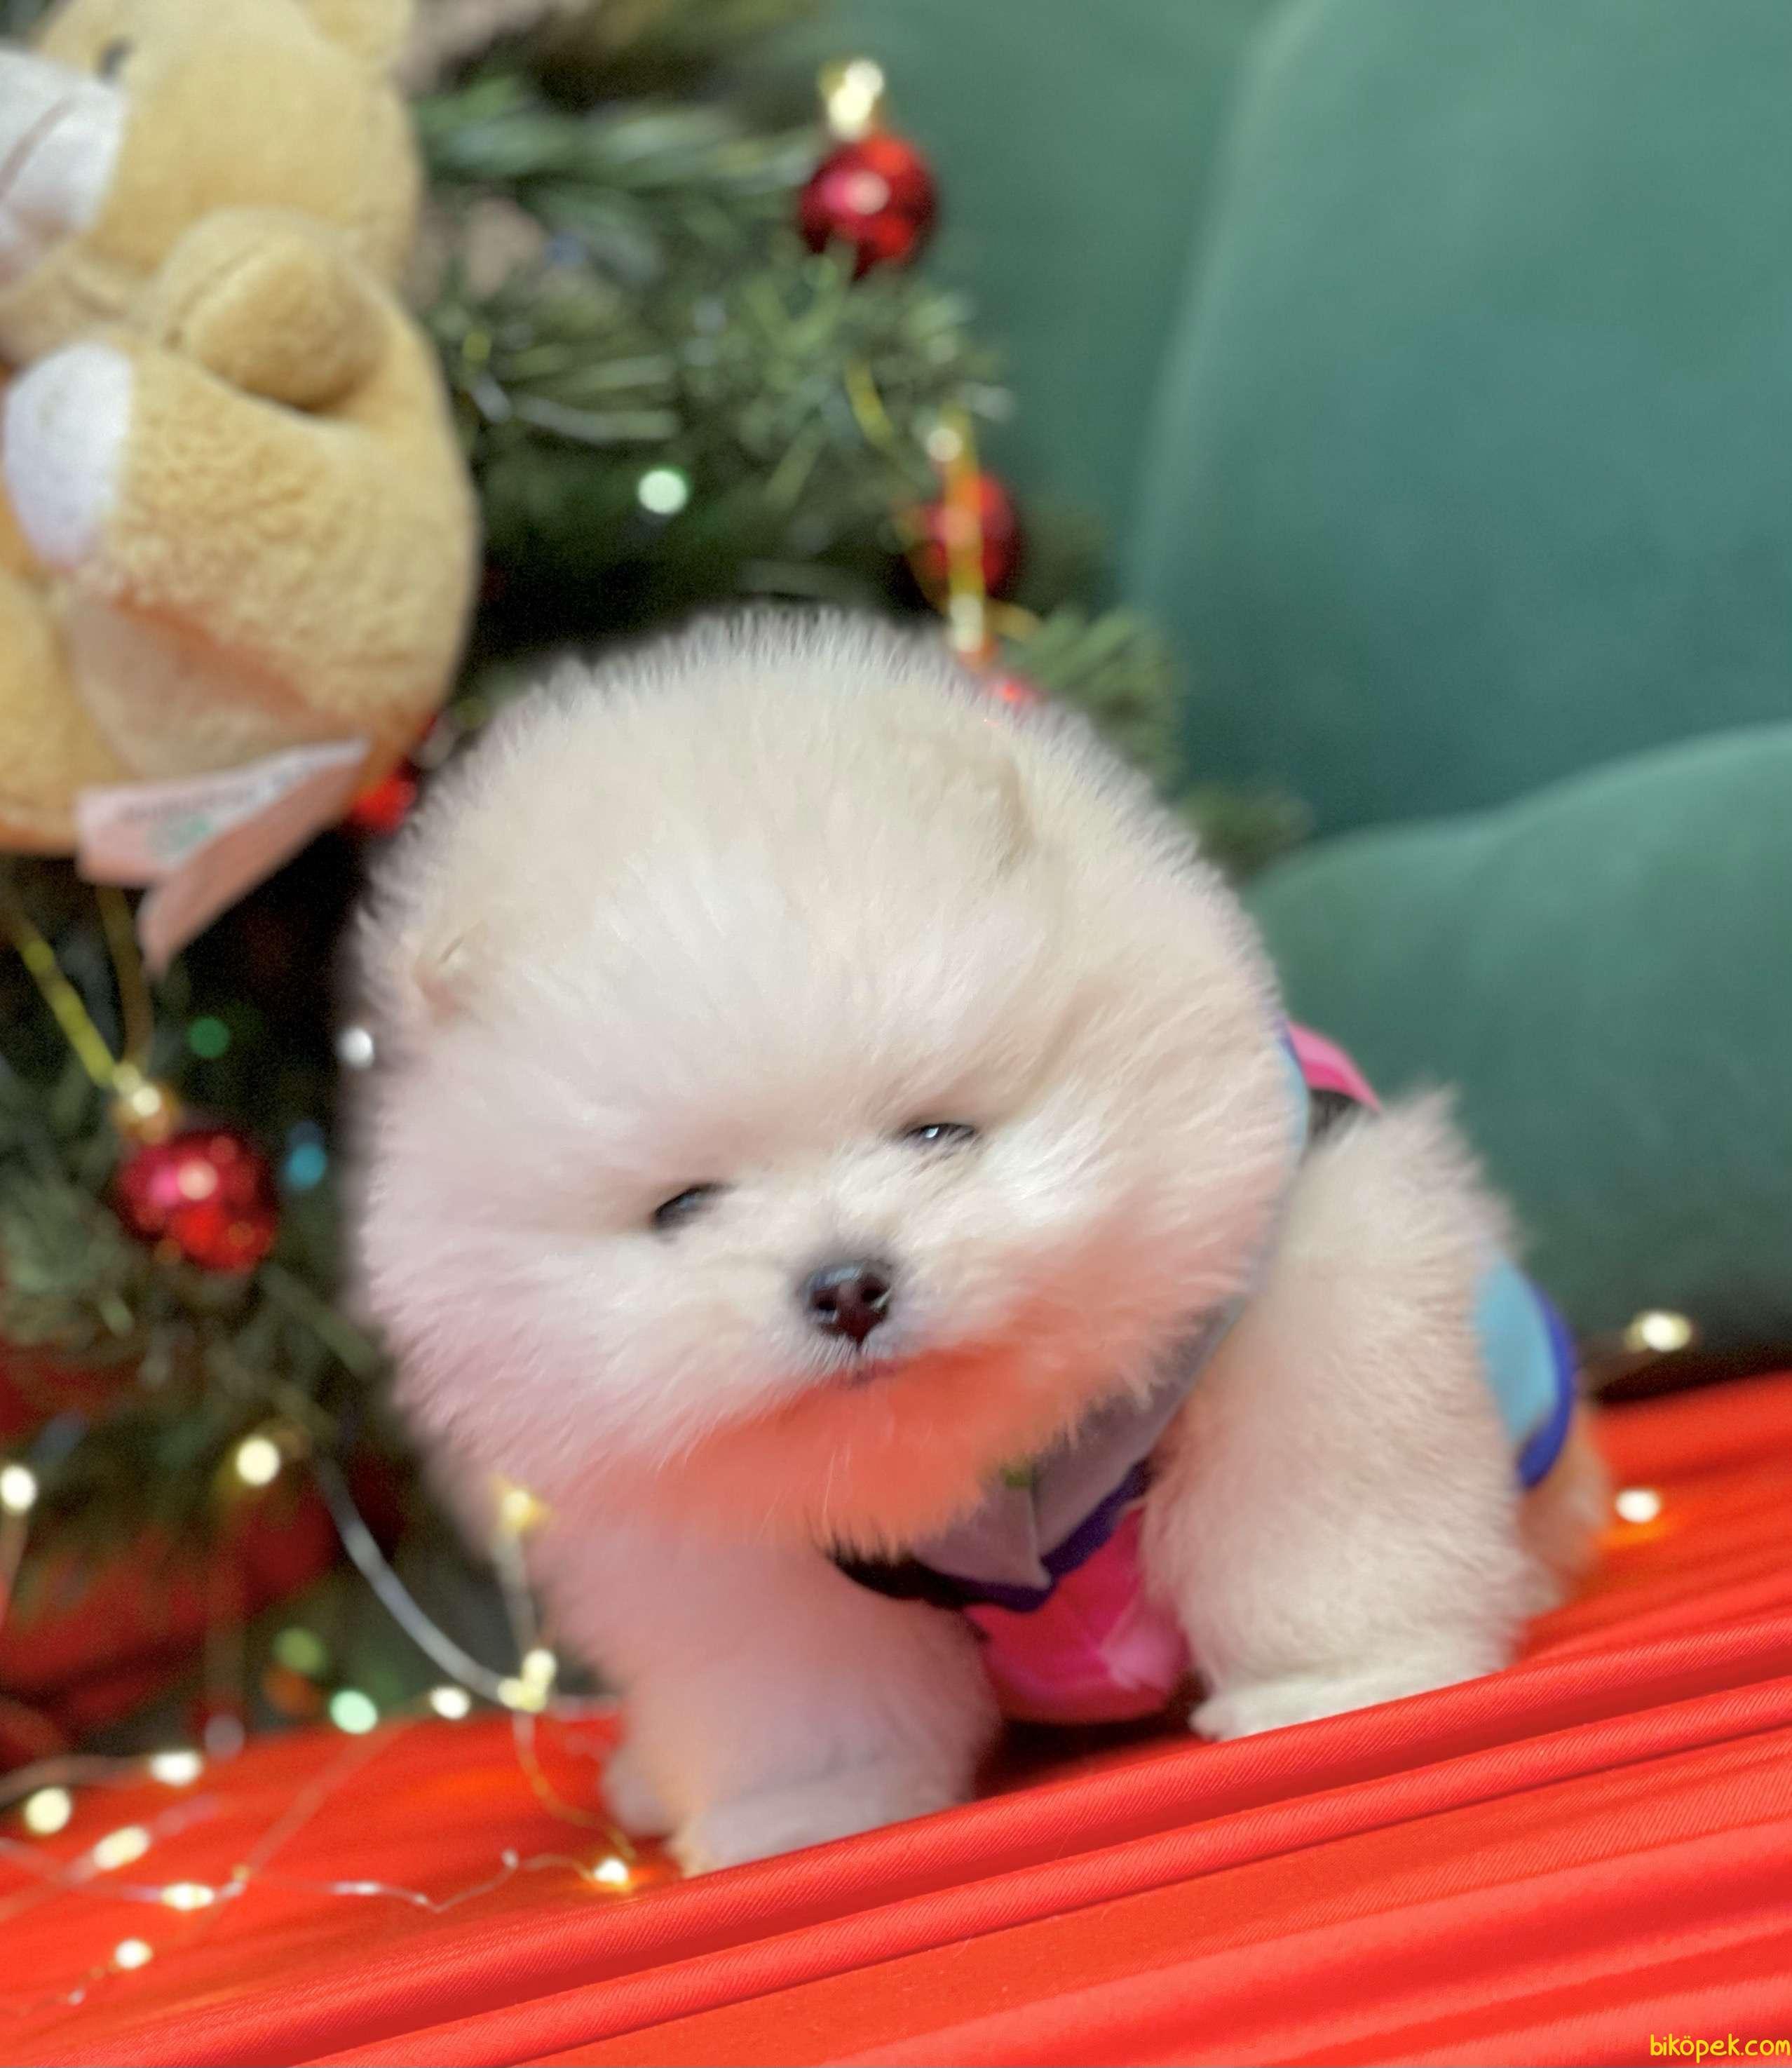 Pomeranian Boo Teddy Bear Yavrularımız Ayicik Suratlı 4